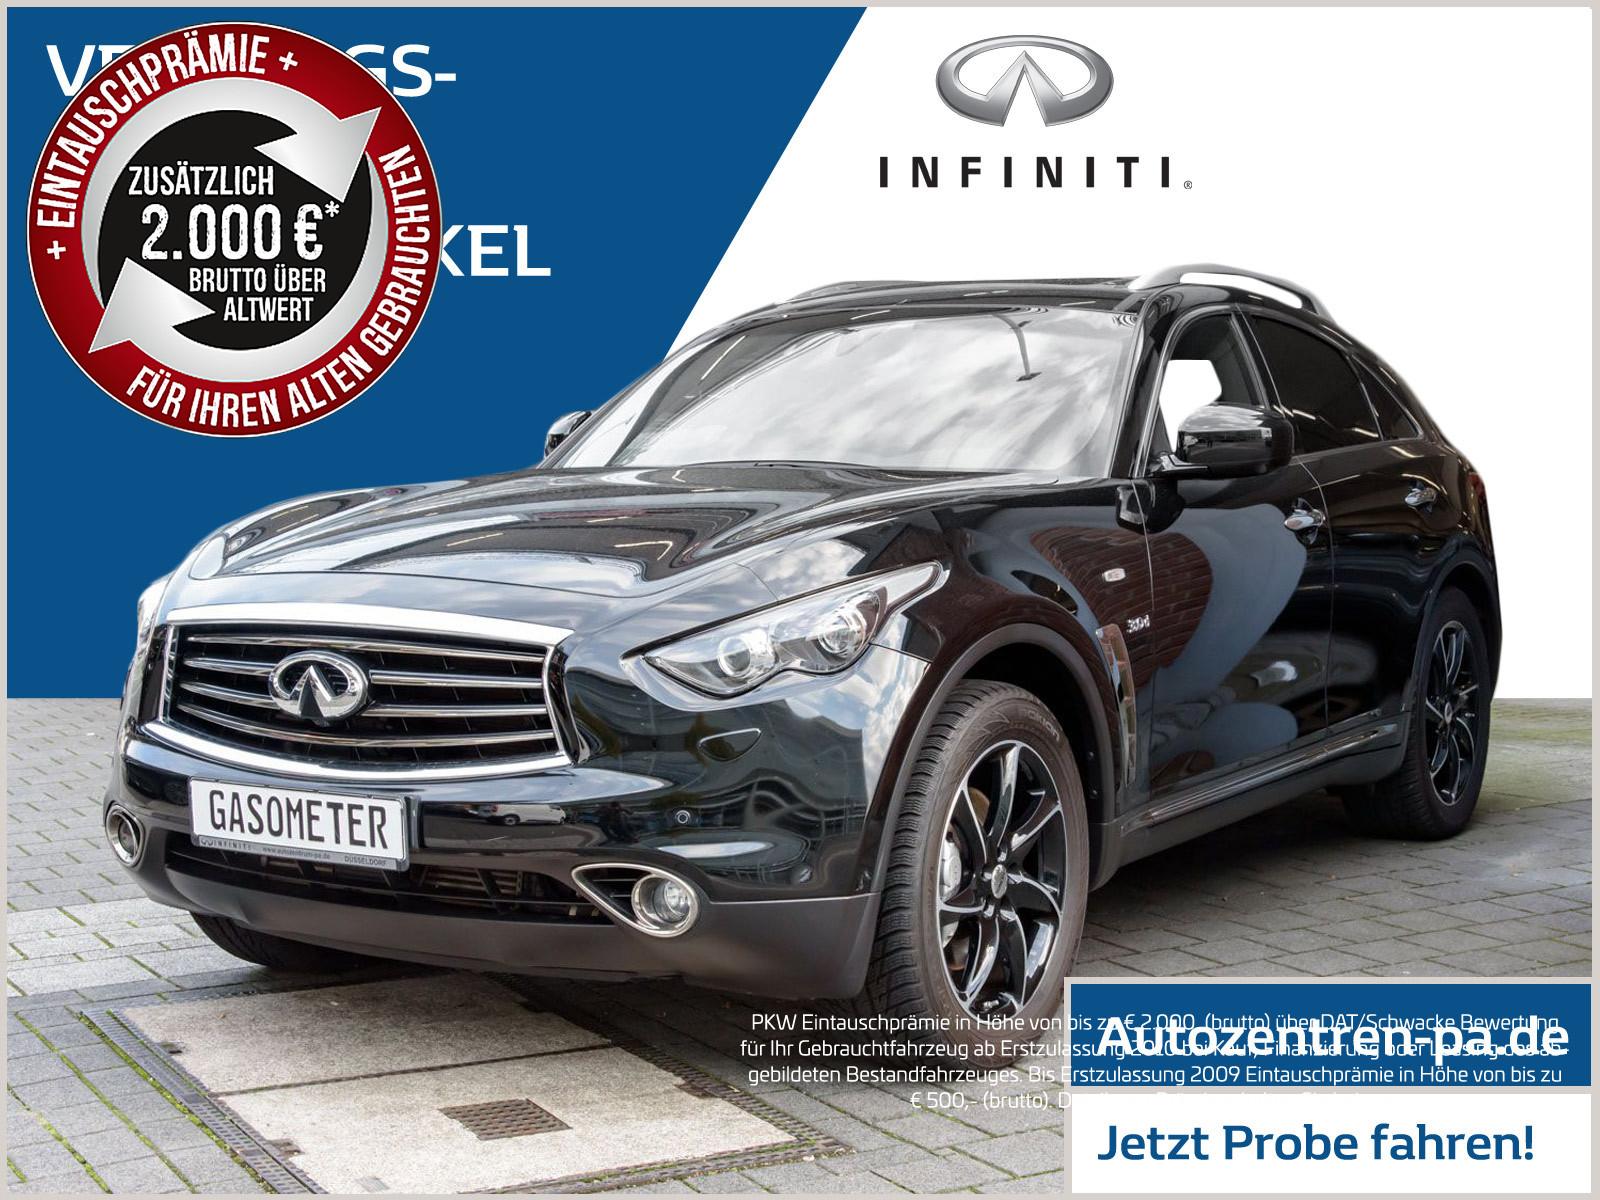 Infiniti QX70d S Premium AWD Autom / Navi / PDC / GSD / Klima / Leder, Jahr 2013, diesel